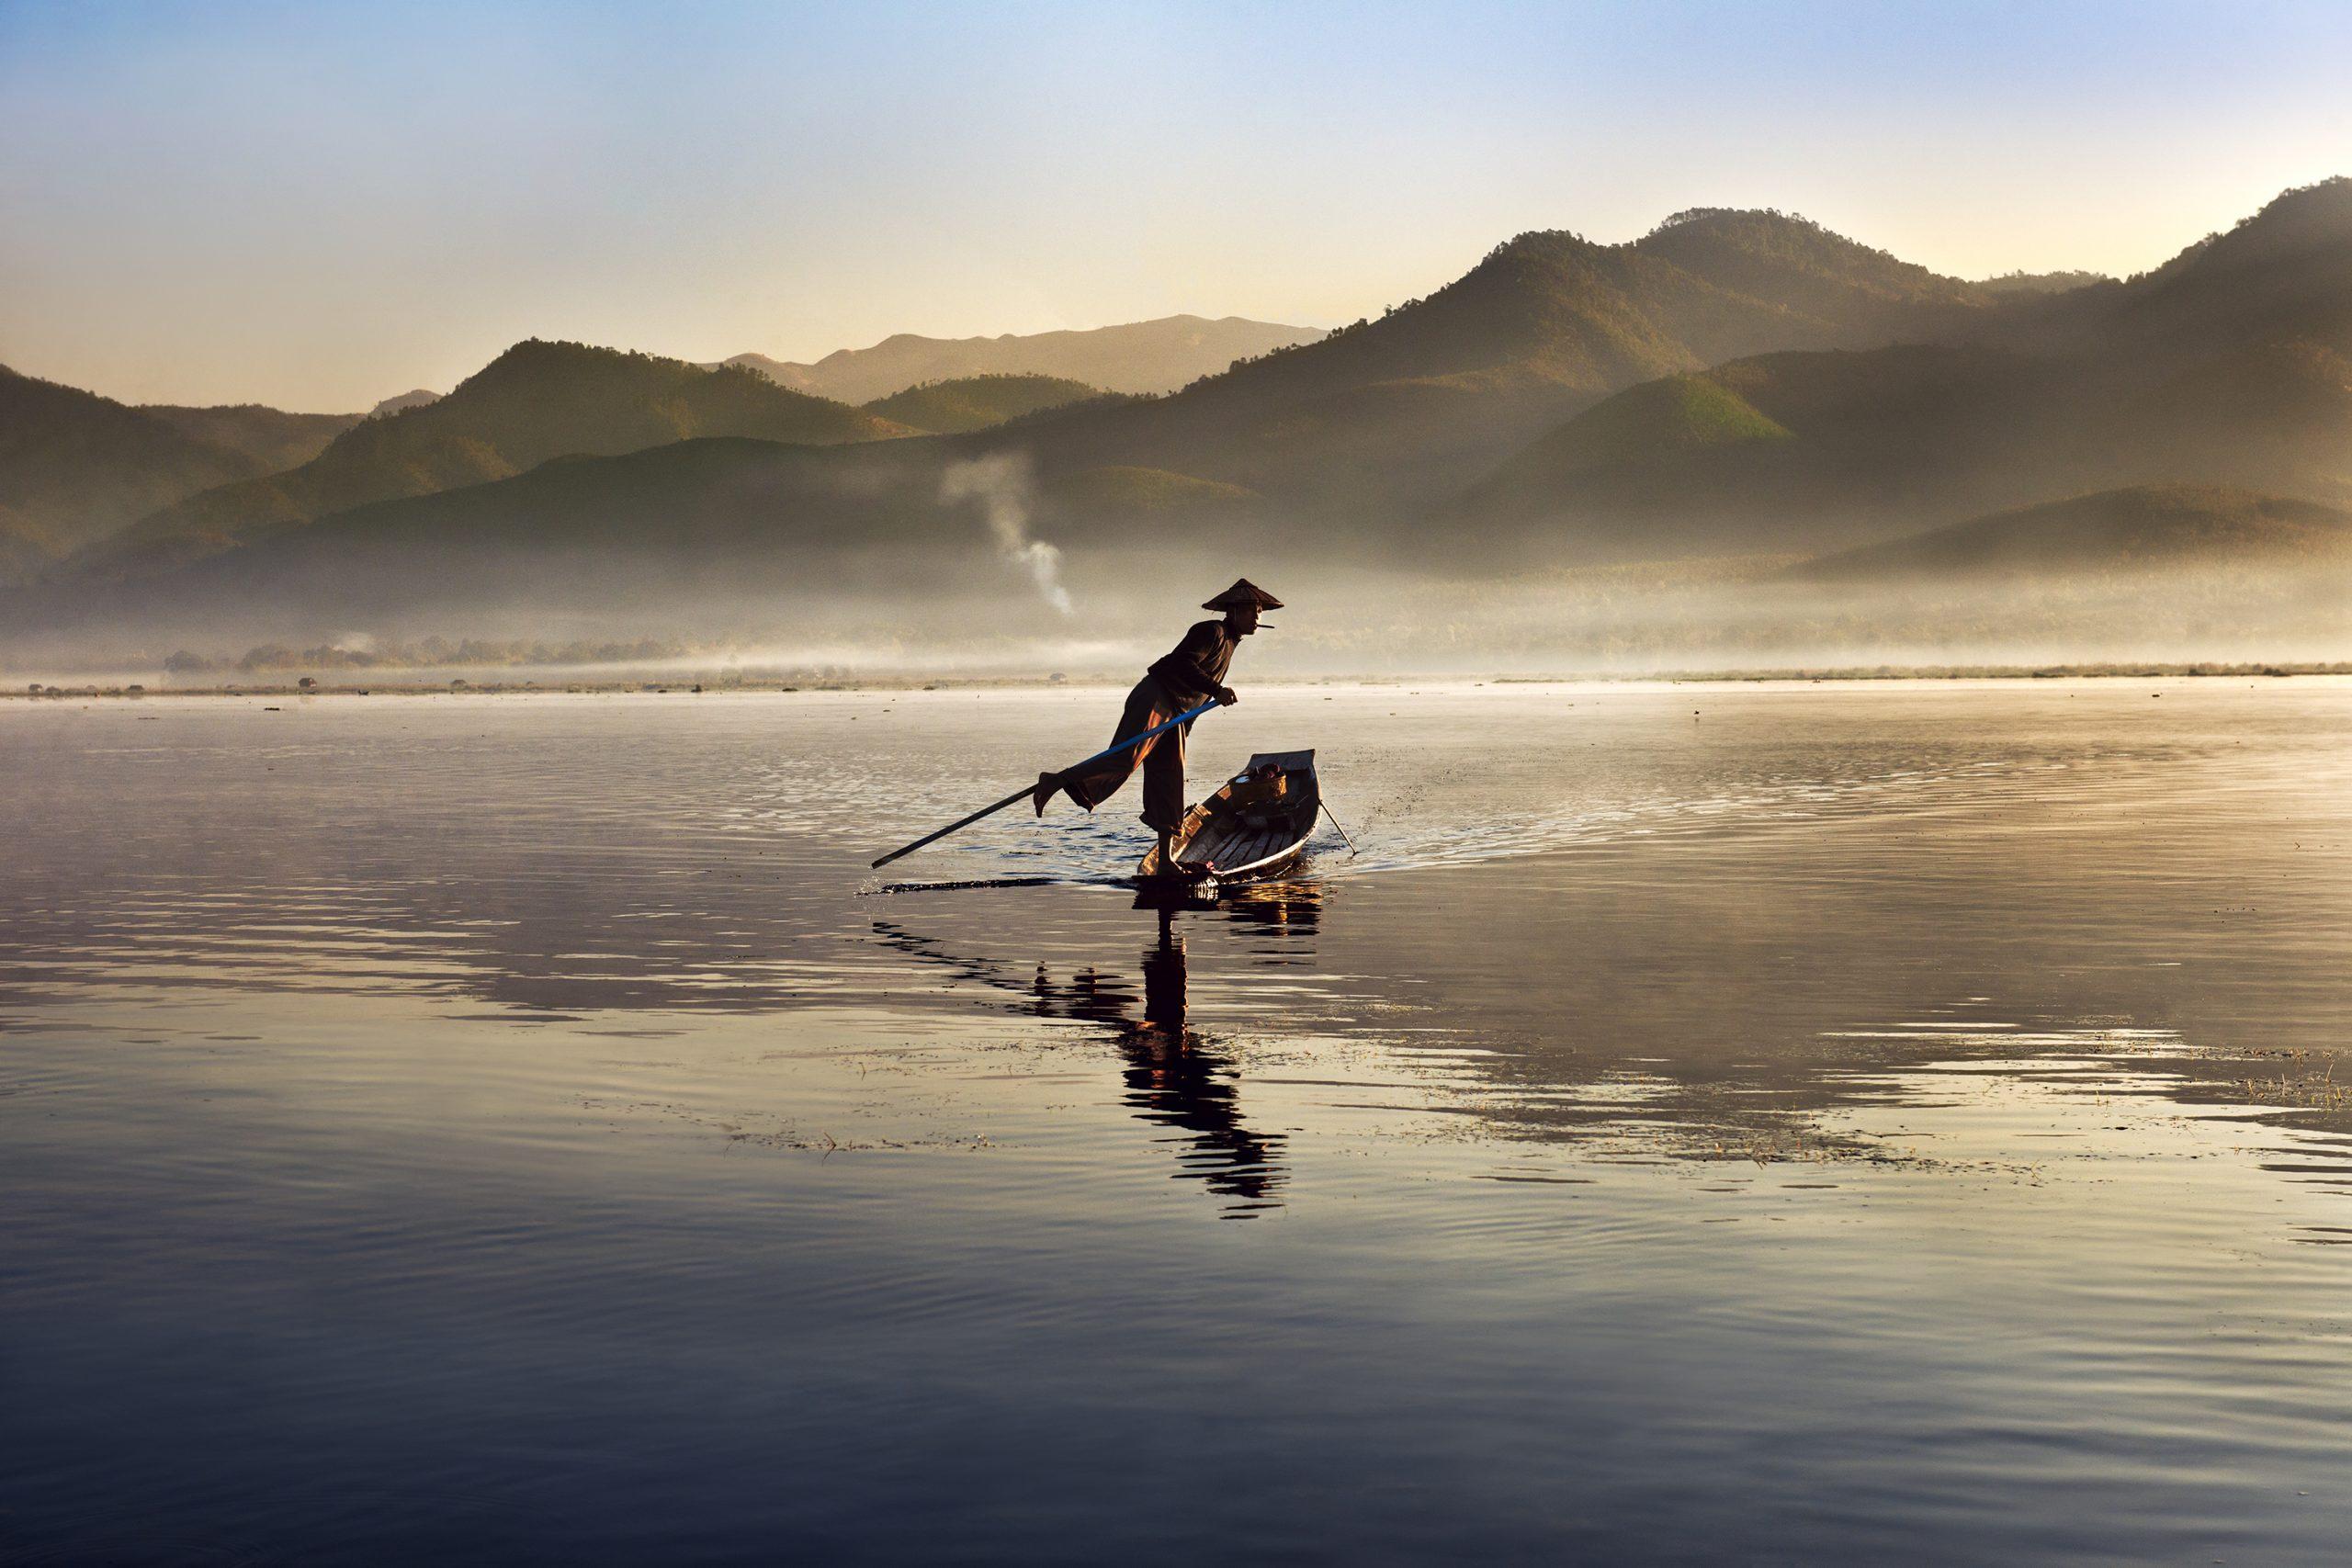 Steve McCurry, Inle Lake. Burma, 2011, ©Steve McCurry